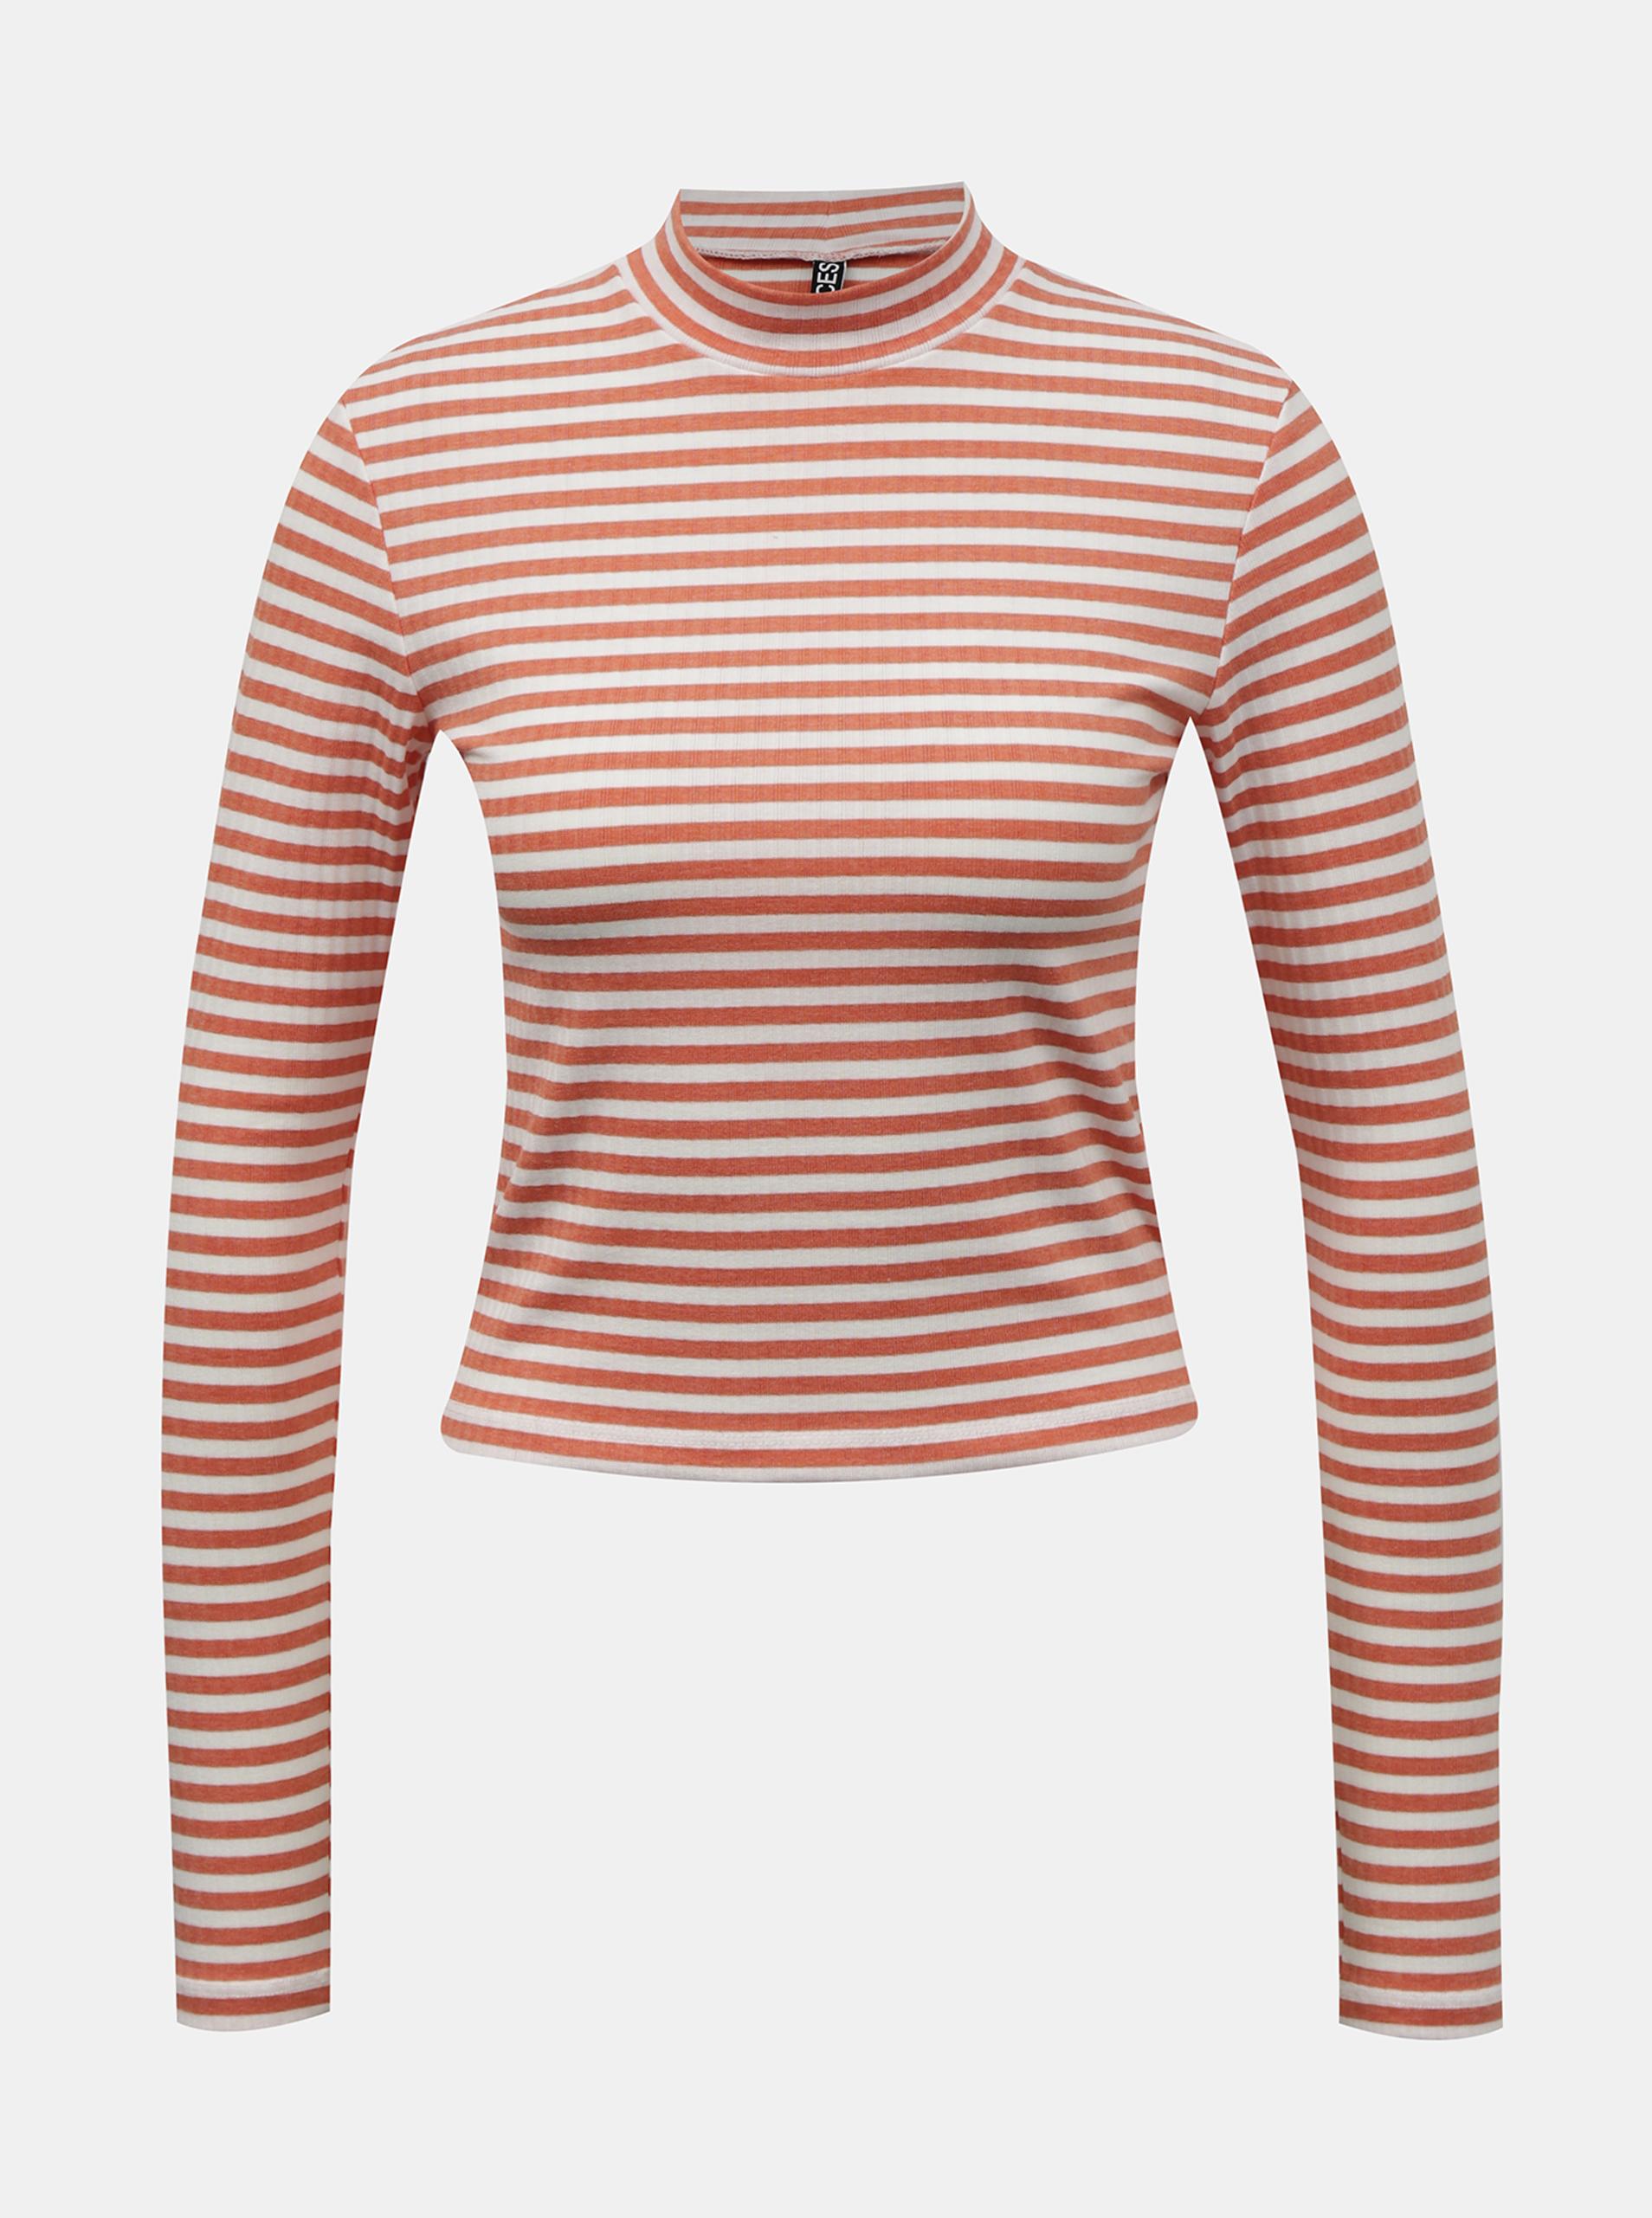 Pieces bílo-oranžové dámské tričko Raya